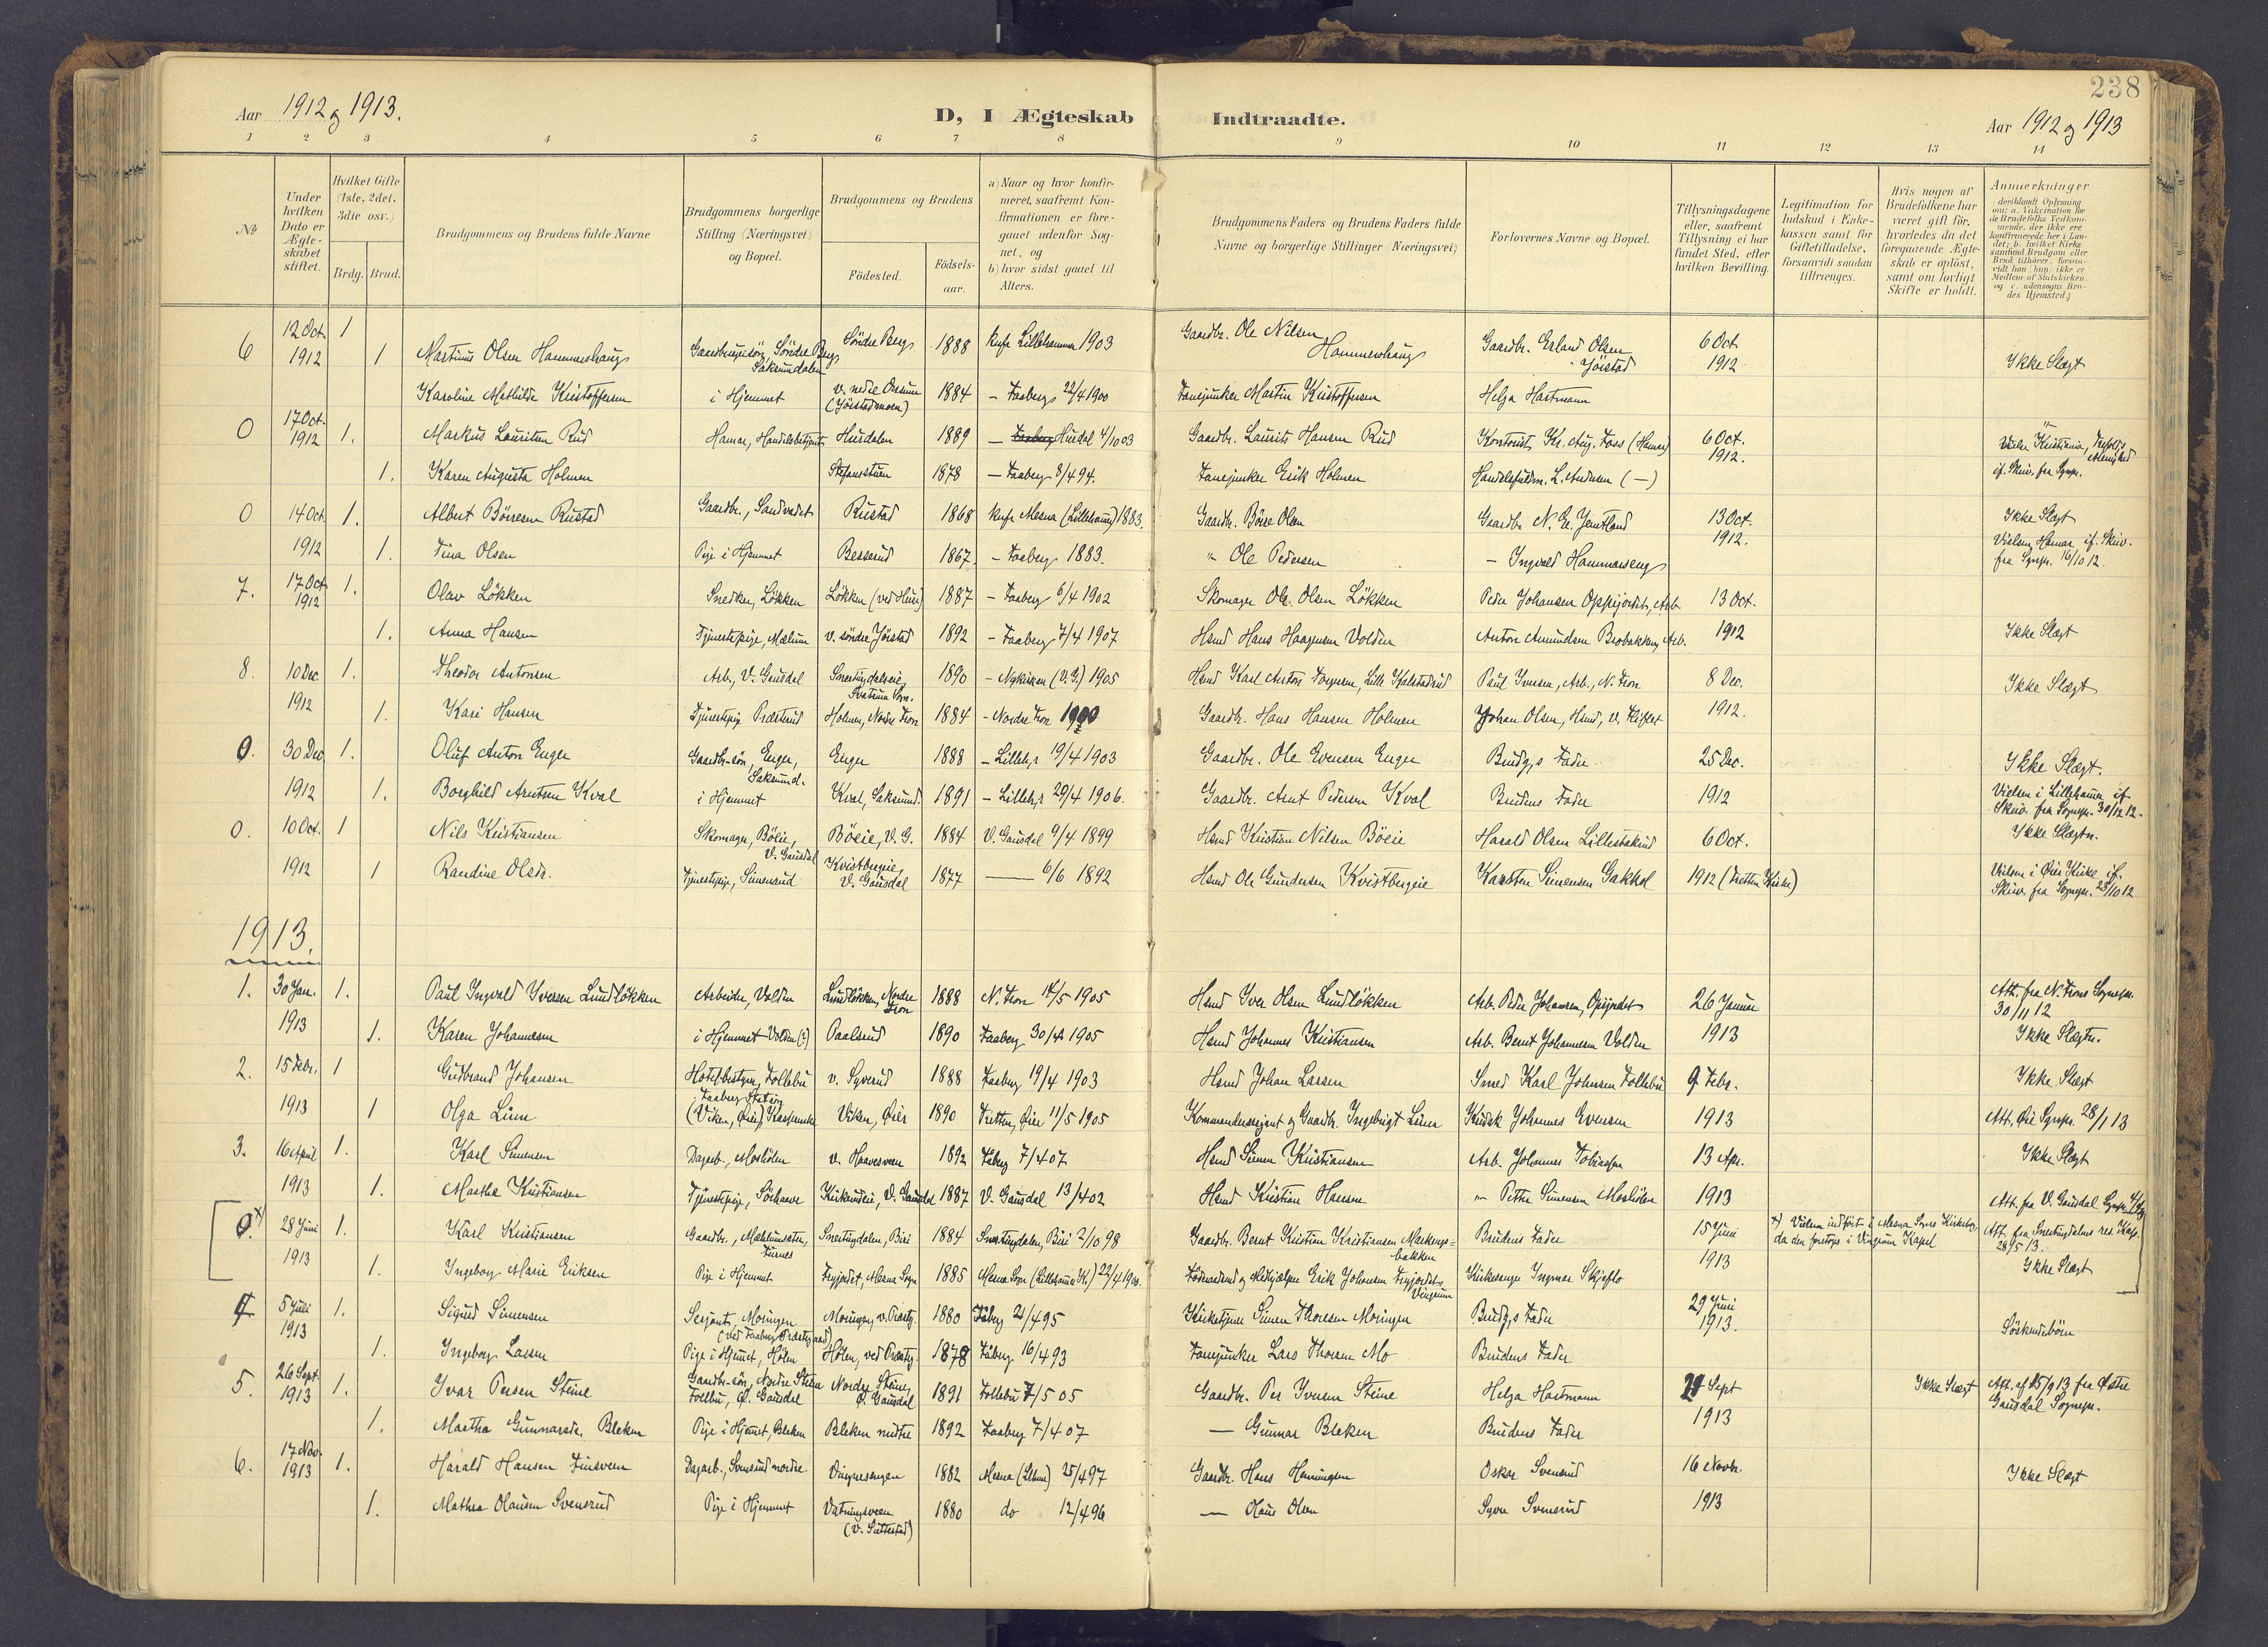 SAH, Fåberg prestekontor, Ministerialbok nr. 12, 1899-1915, s. 238